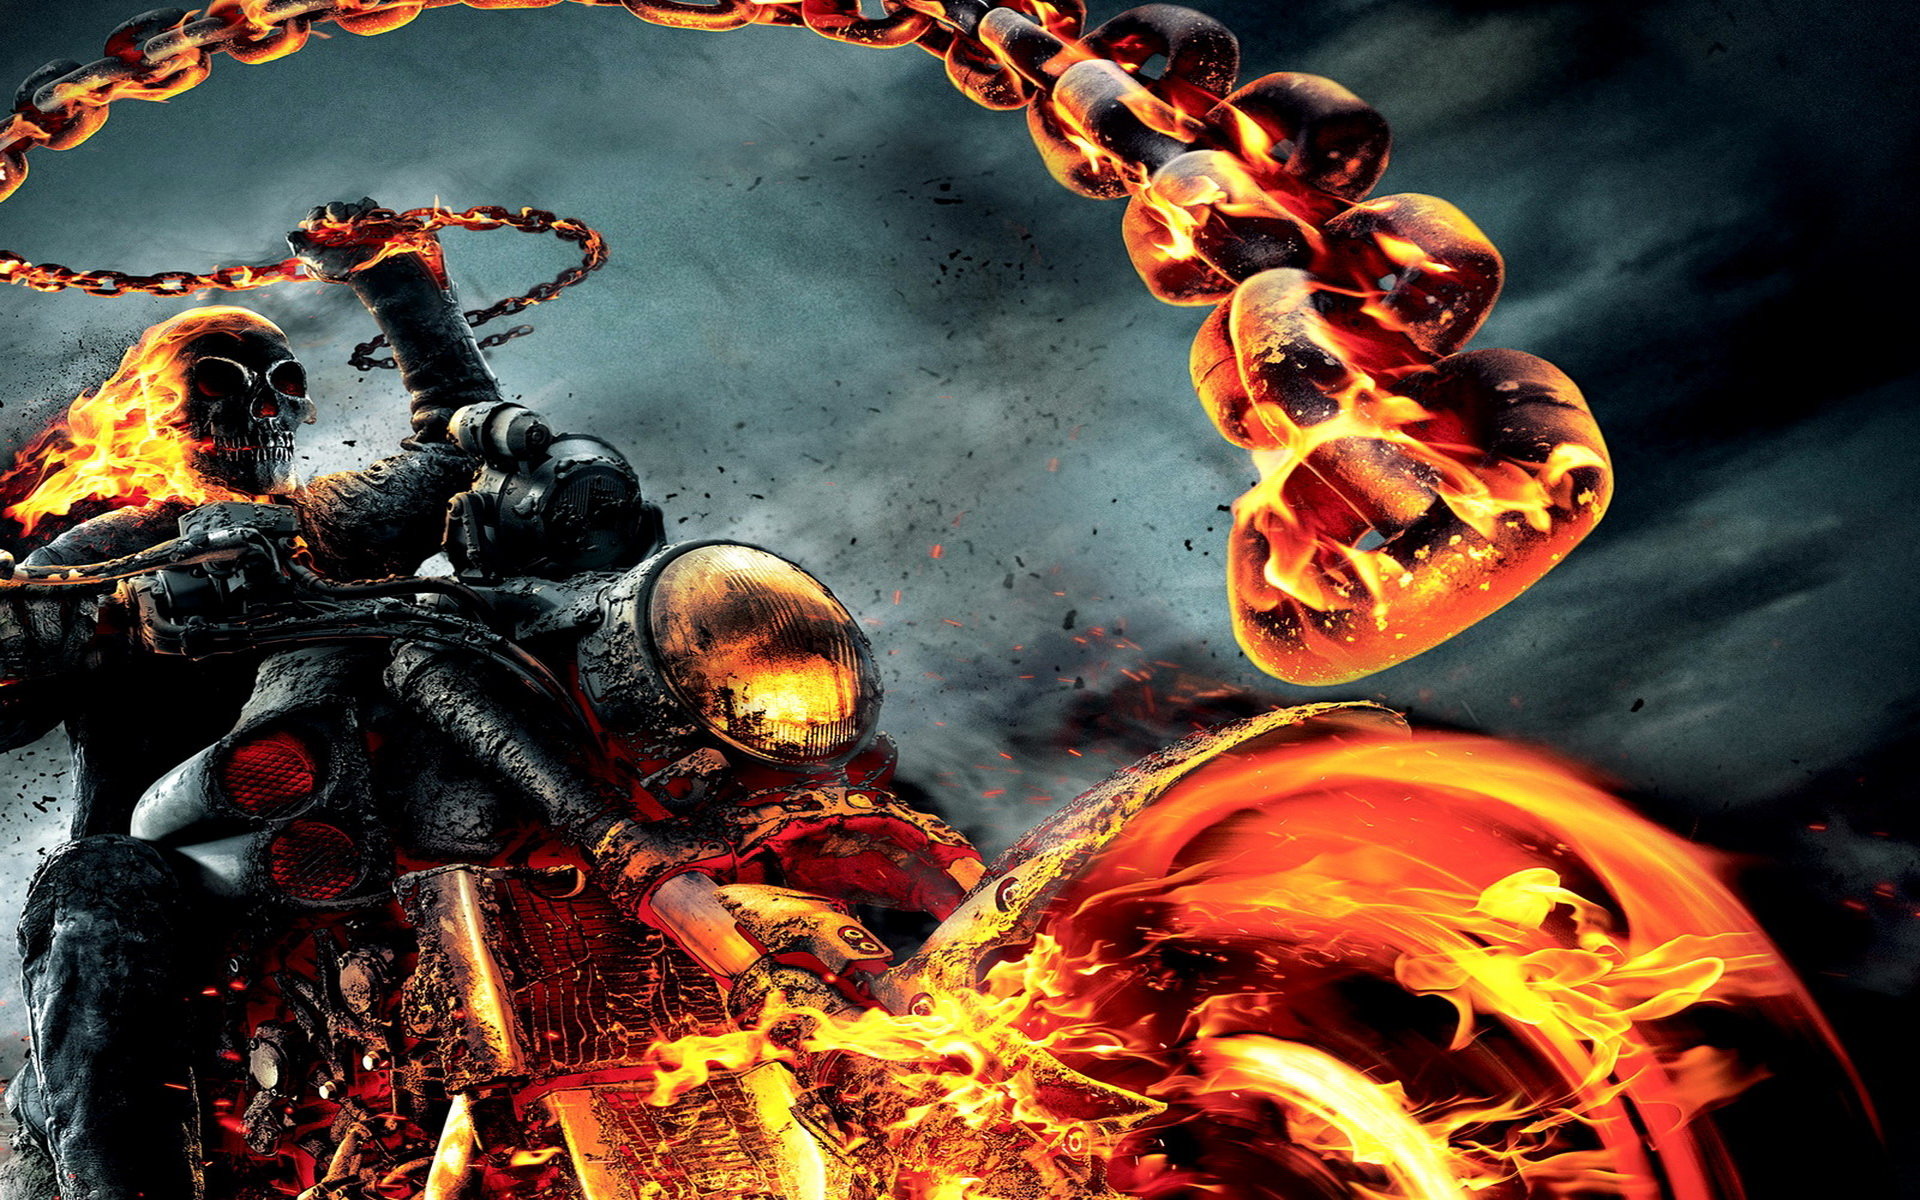 Ghost Rider Hd Wallpaper